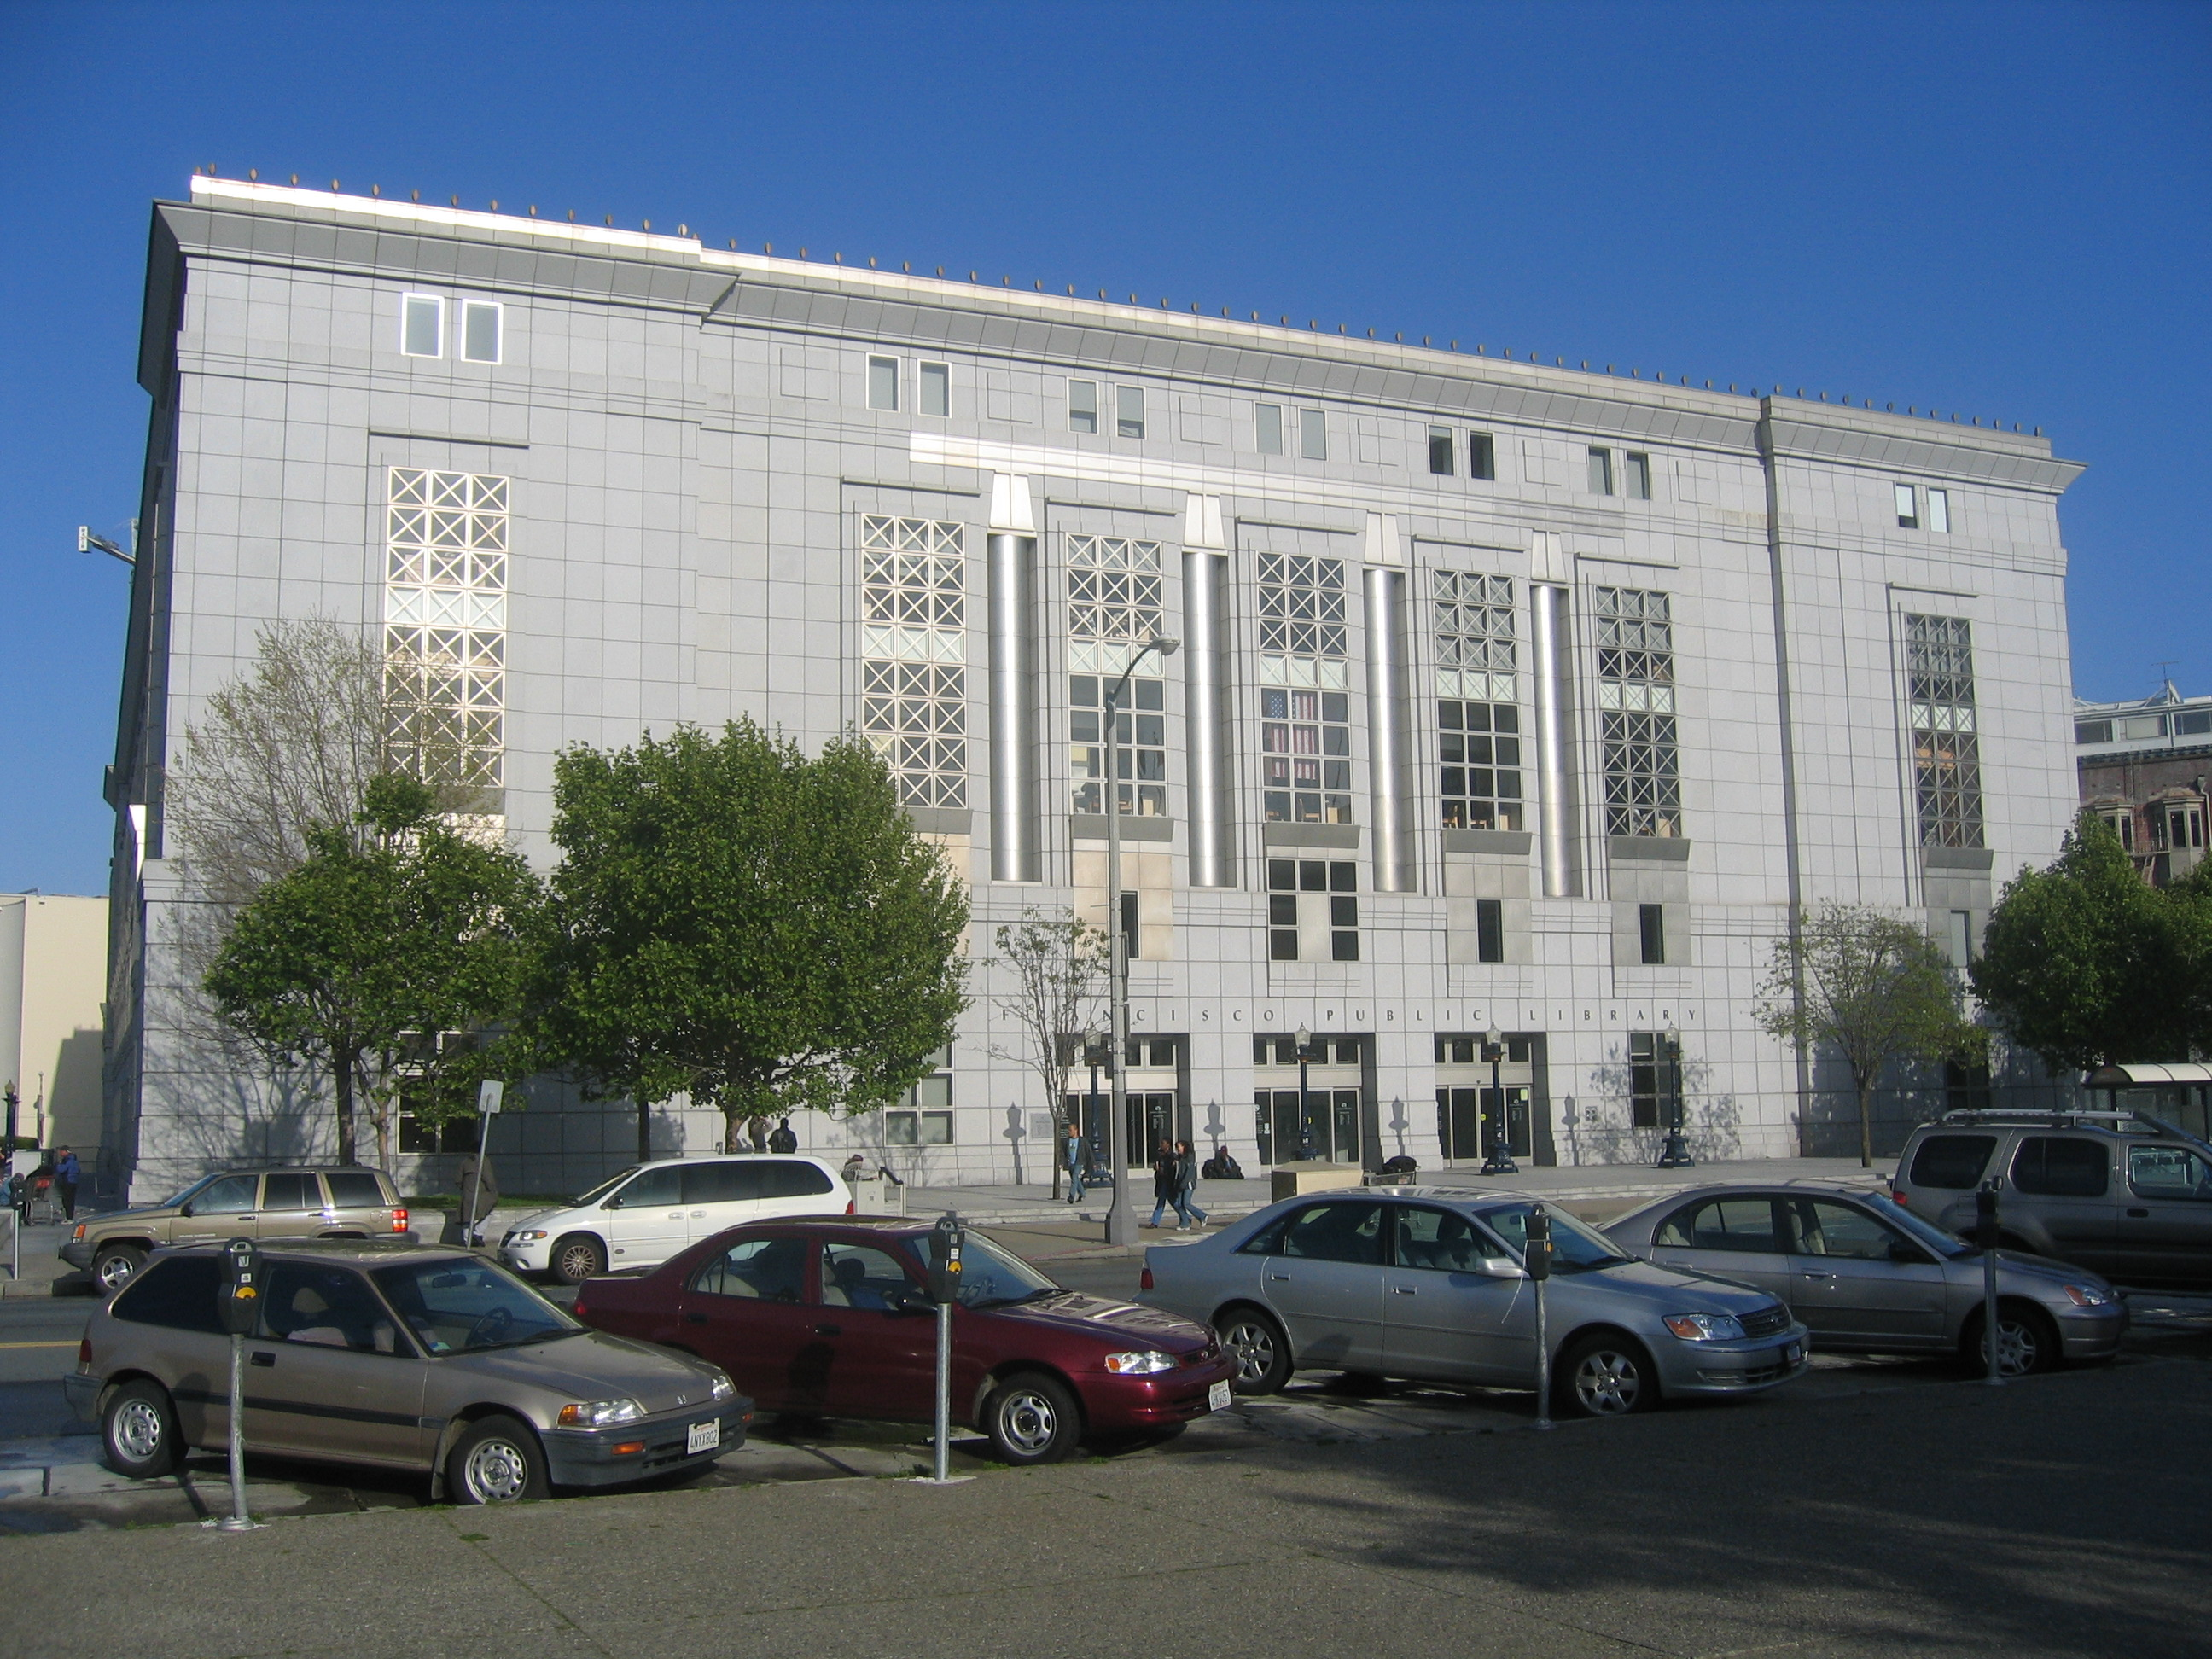 SF Main Public Library Facade (by Alexander Marks)